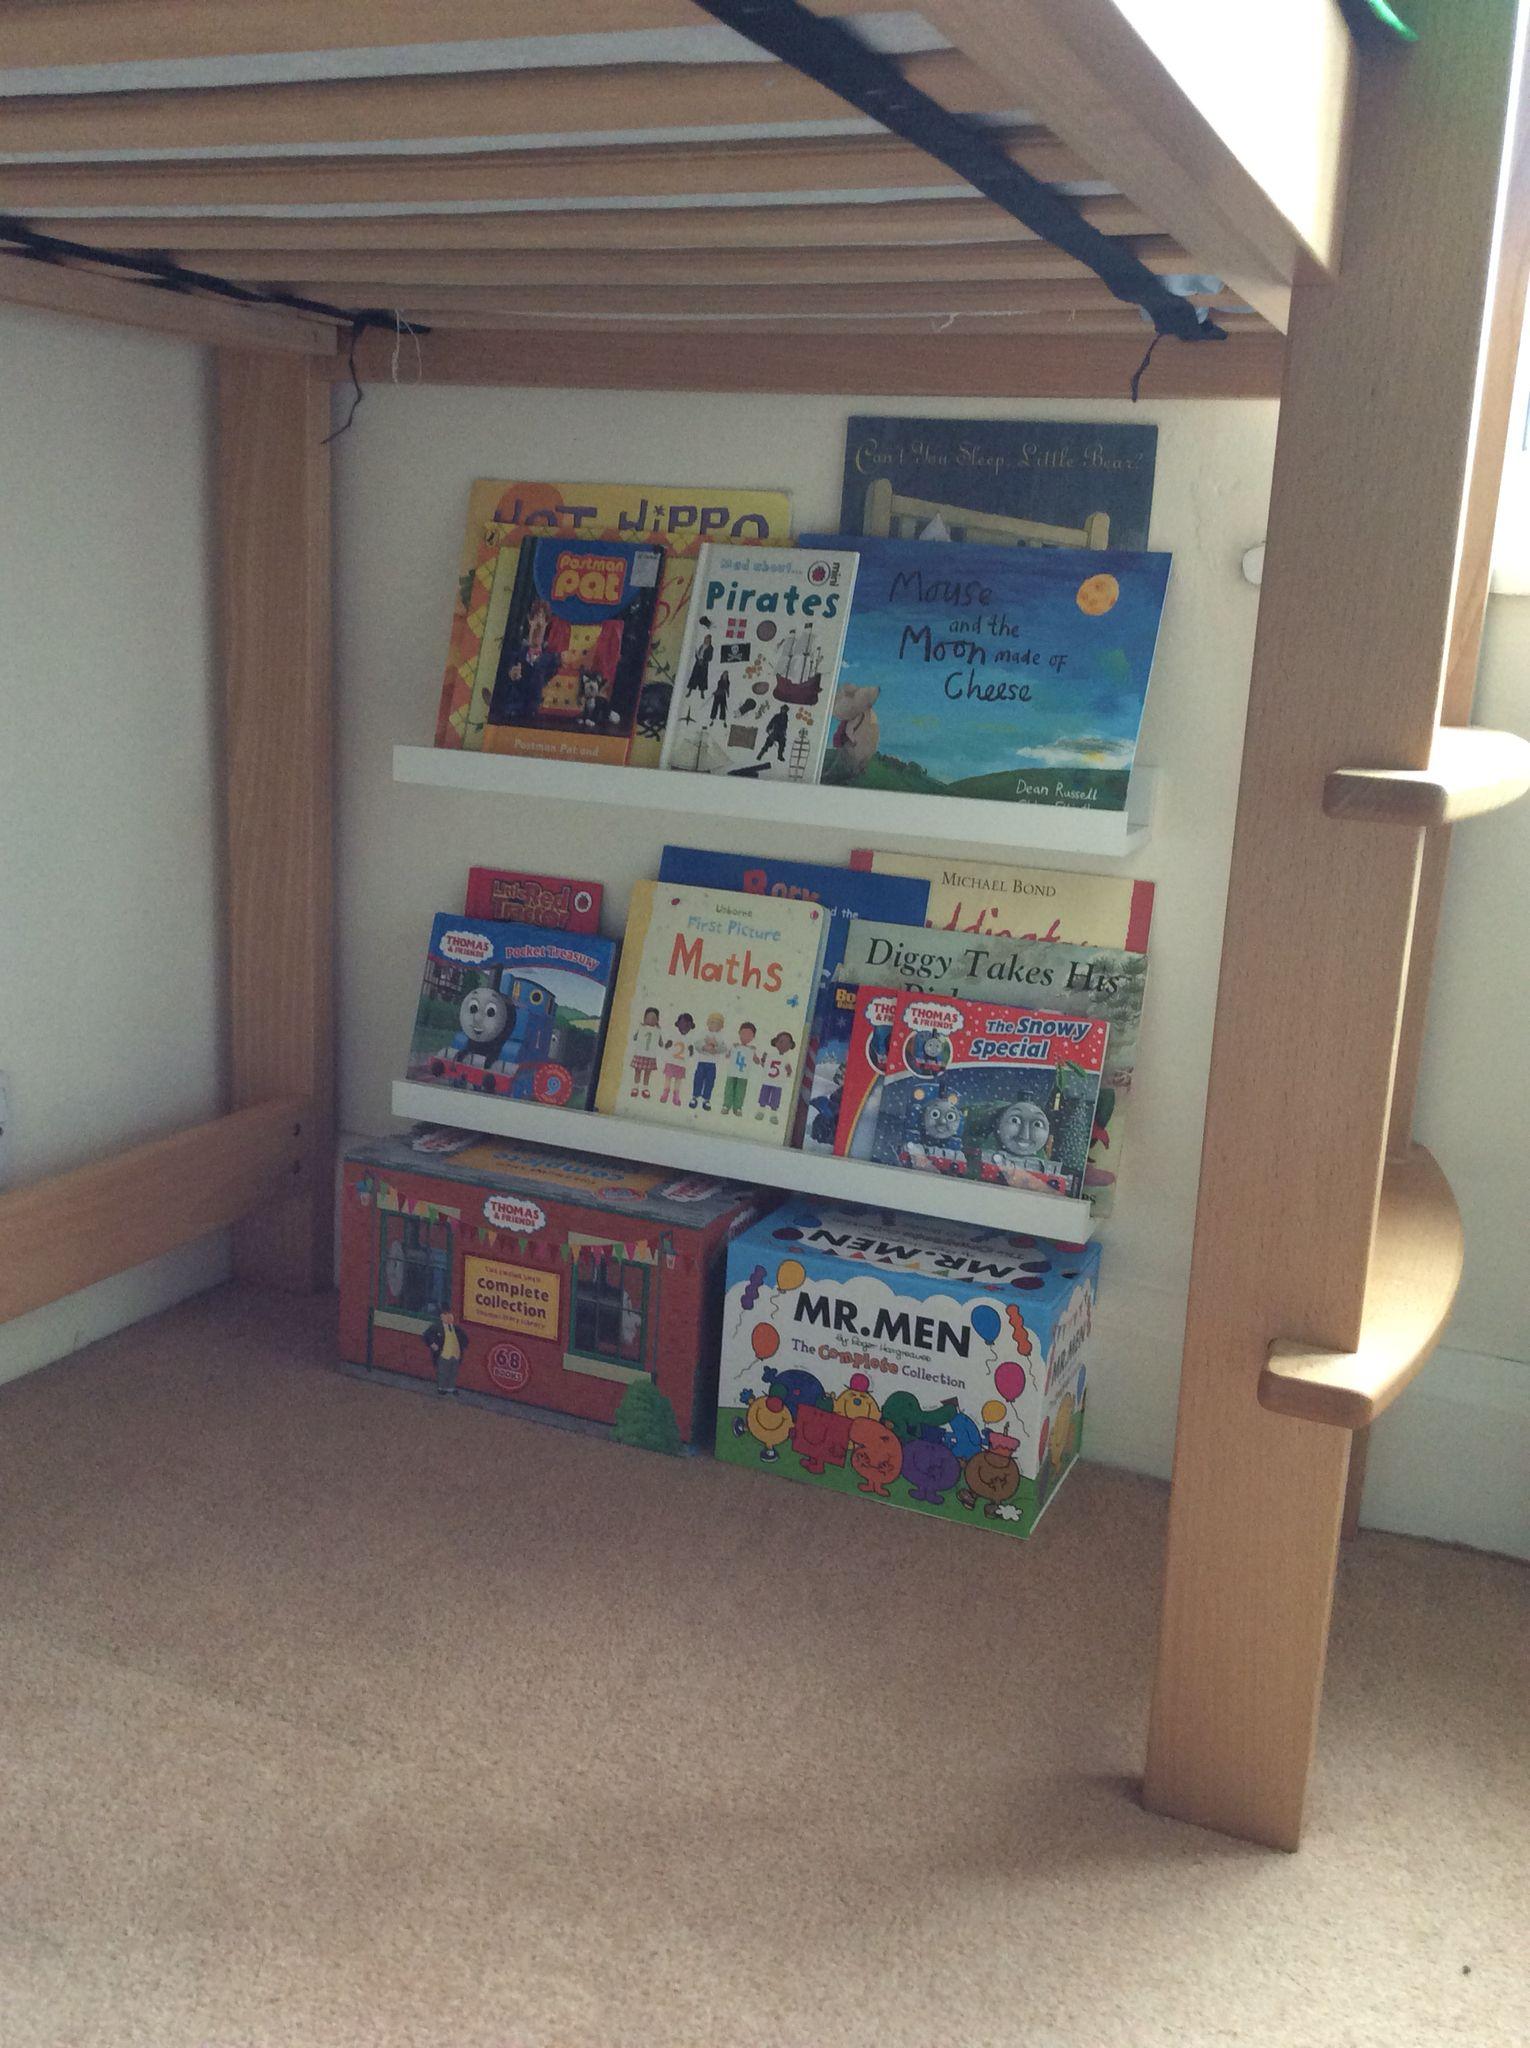 ikea ribba picture ledges used to create bookshelves and a mini